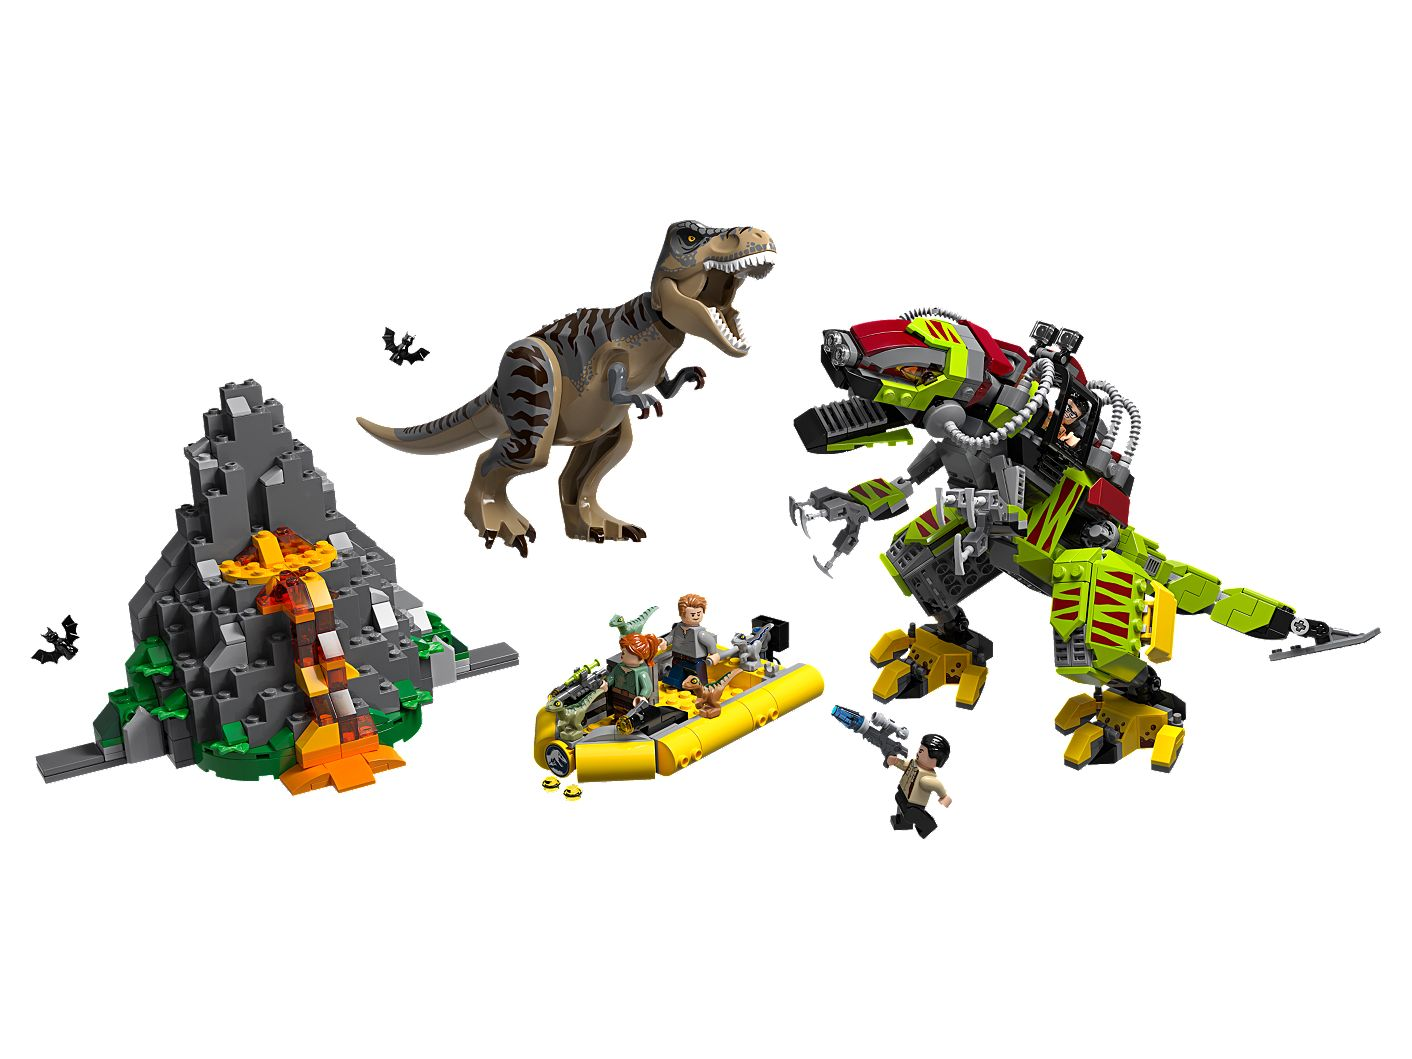 75938Jurassic Es Robótico World™ TRex Oficial Shop Lego® VsDinosaurio E2eD9YWHI